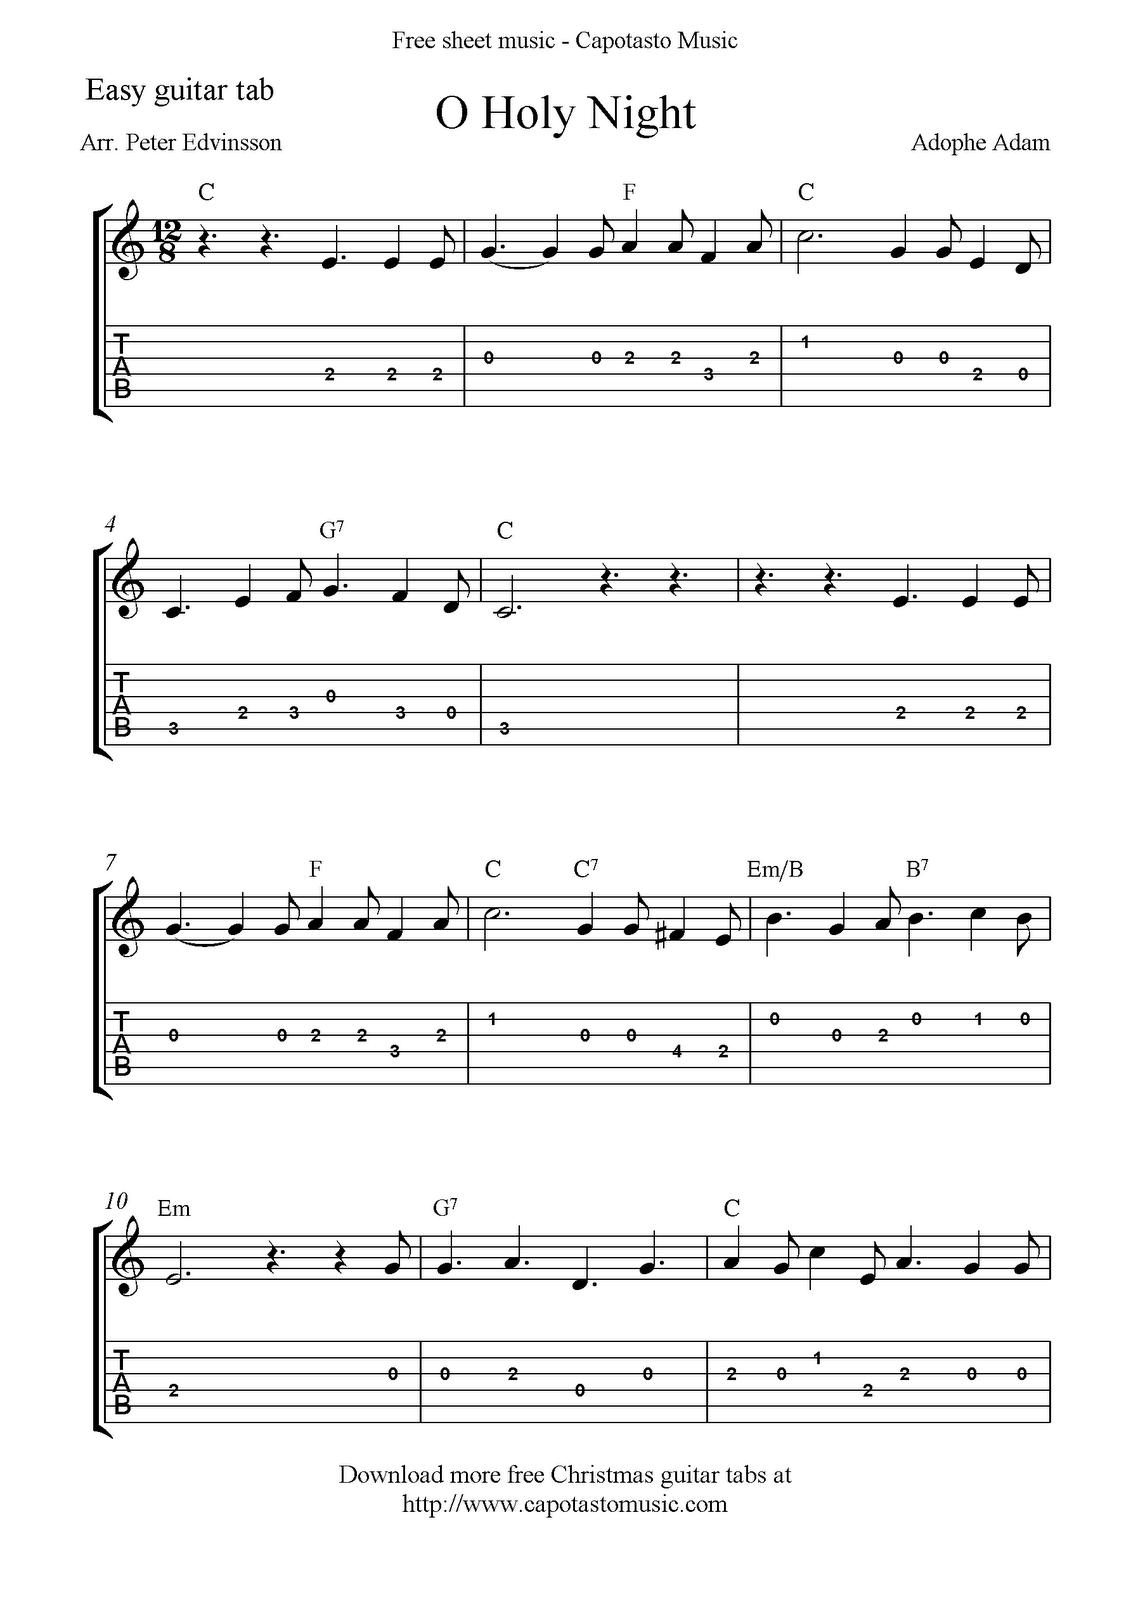 Free Printable Sheet Music: O Holy Night, Free Easy Christmas Guitar - Free Printable Guitar Tabs For Beginners